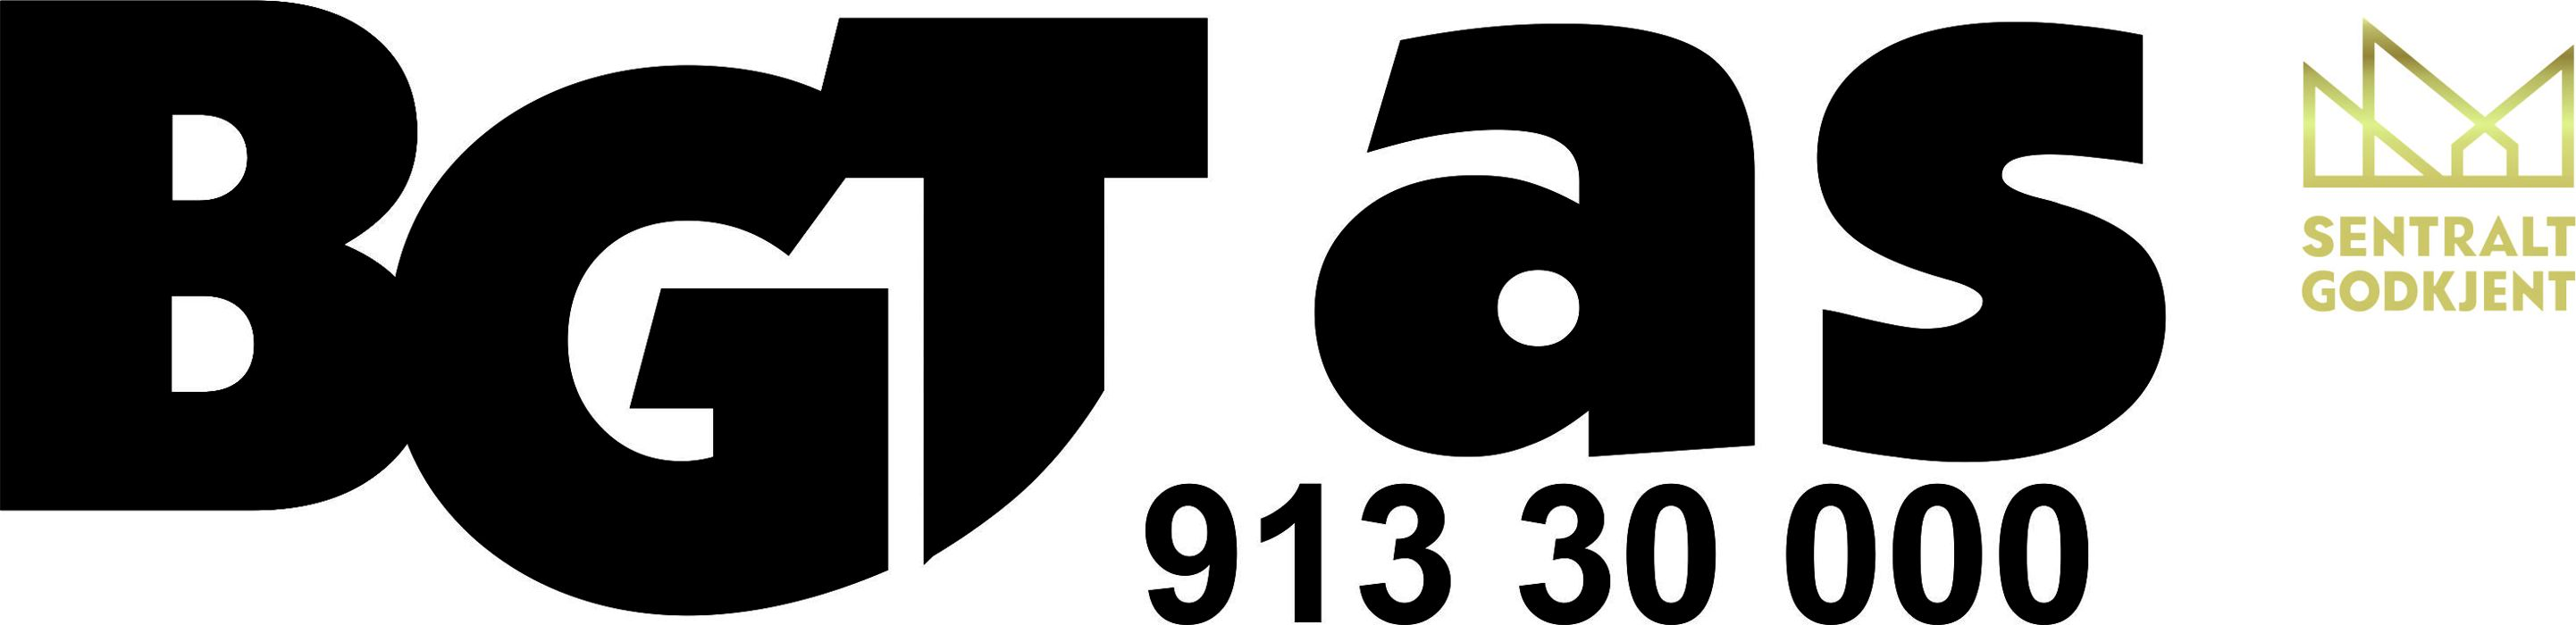 BGT AS logo.jpg